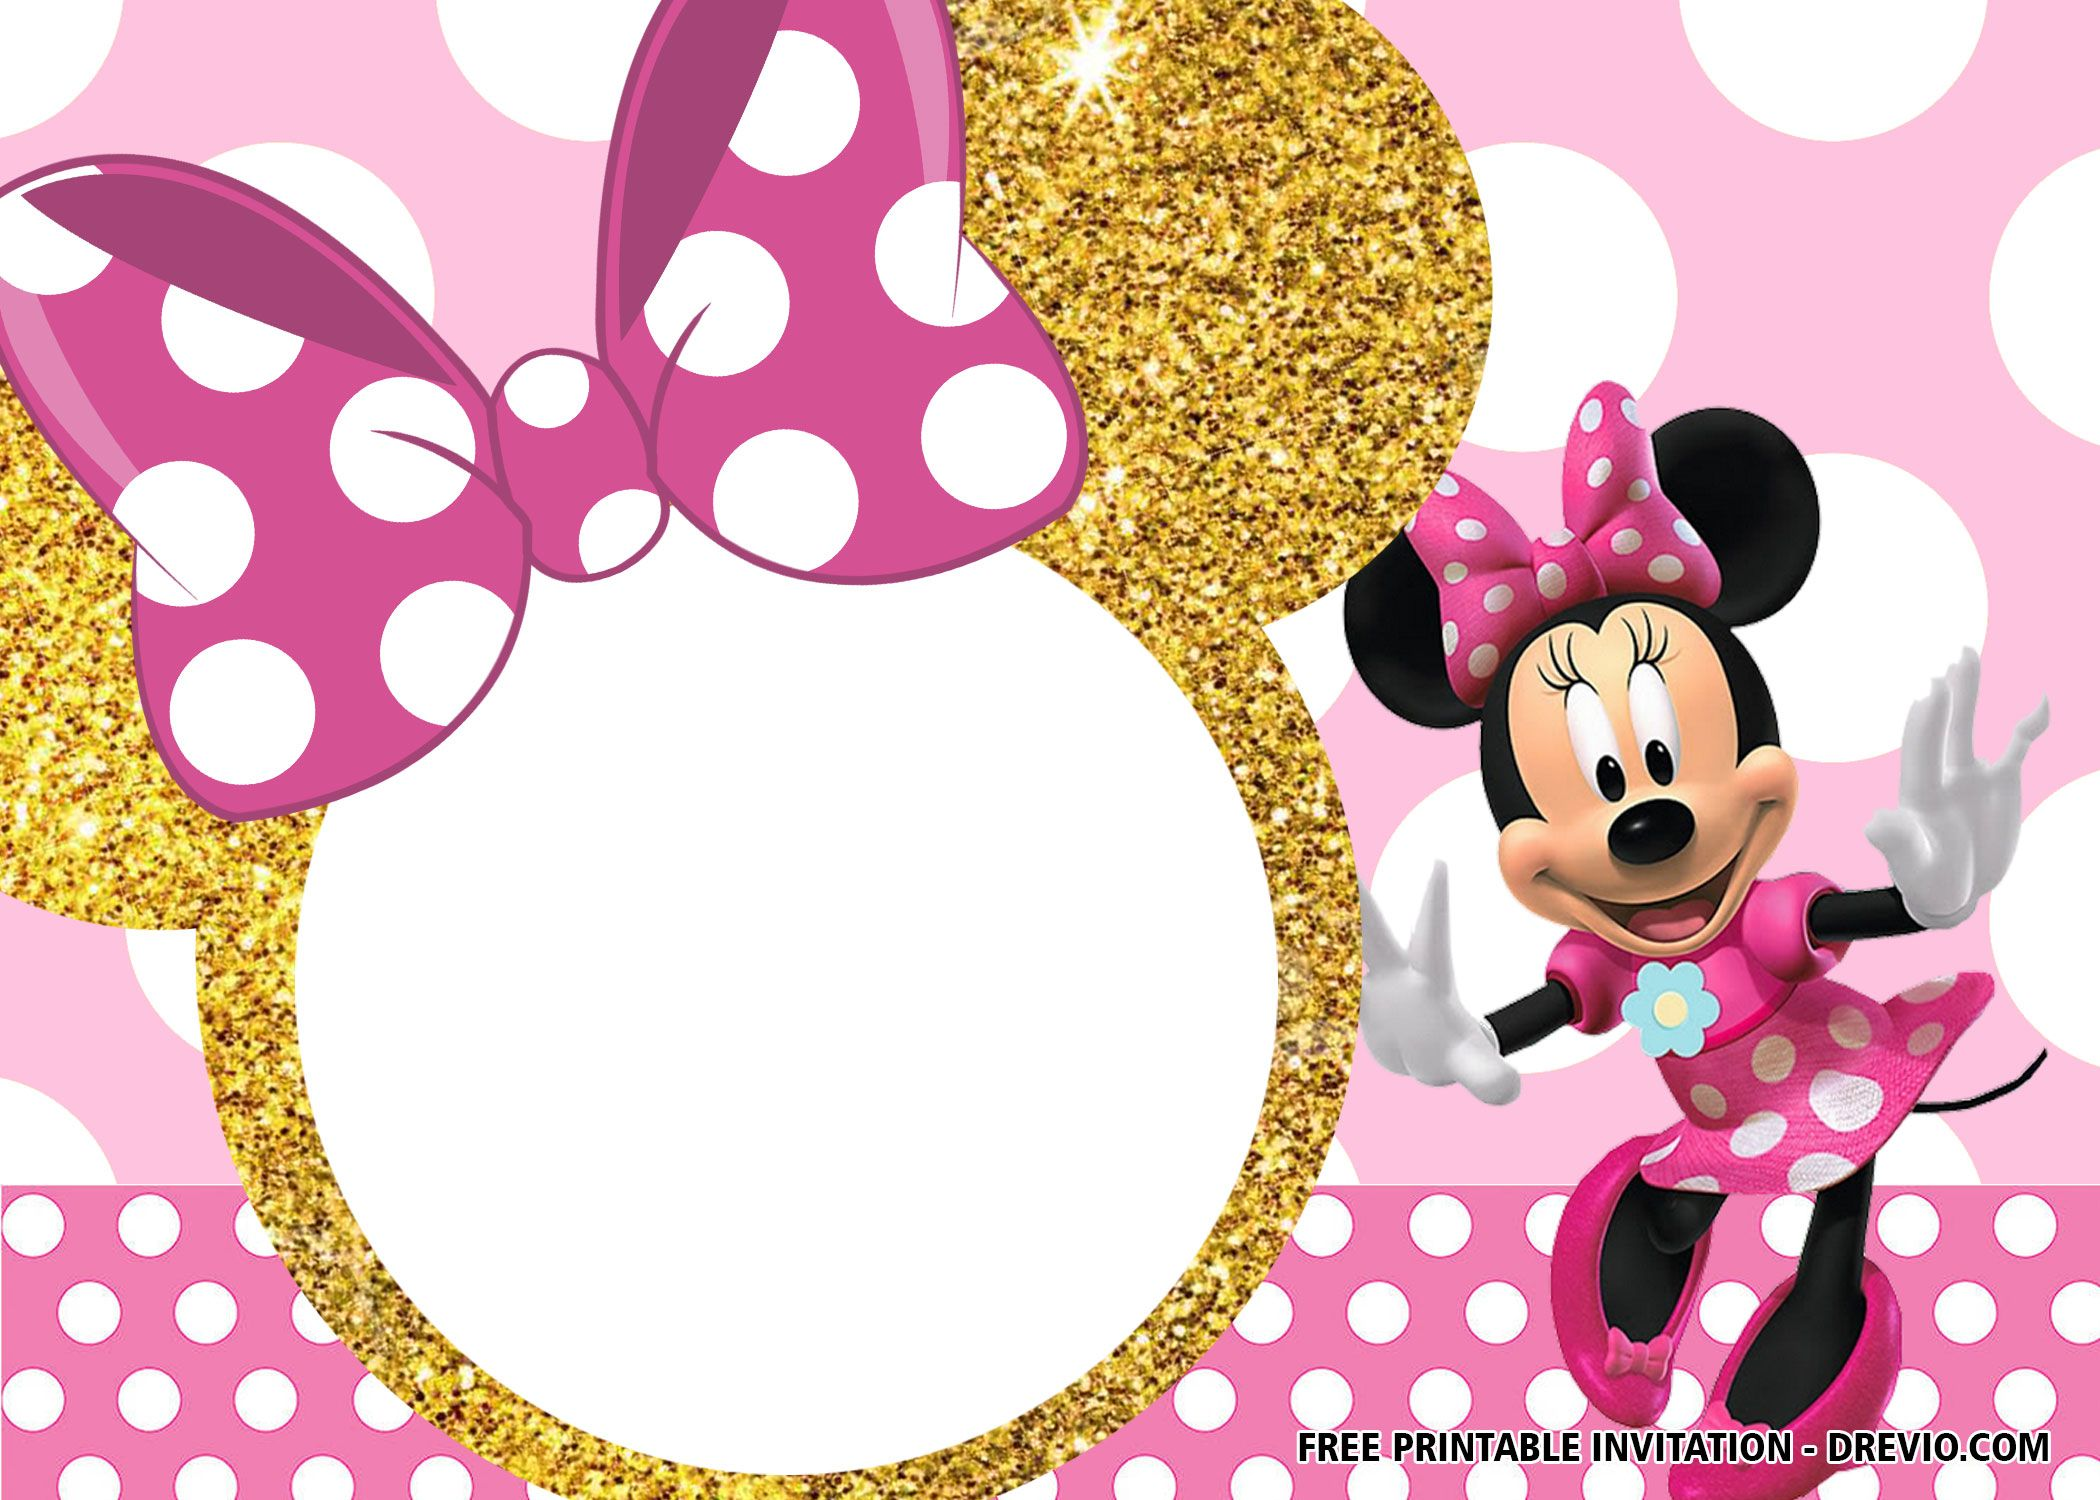 30 Free Printable Minnie Mouse Birthday Invitation Templates Drevio Minnie Mouse Invitations Minnie Mouse Birthday Invitations Minnie Invitations Free minnie mouse invitation template